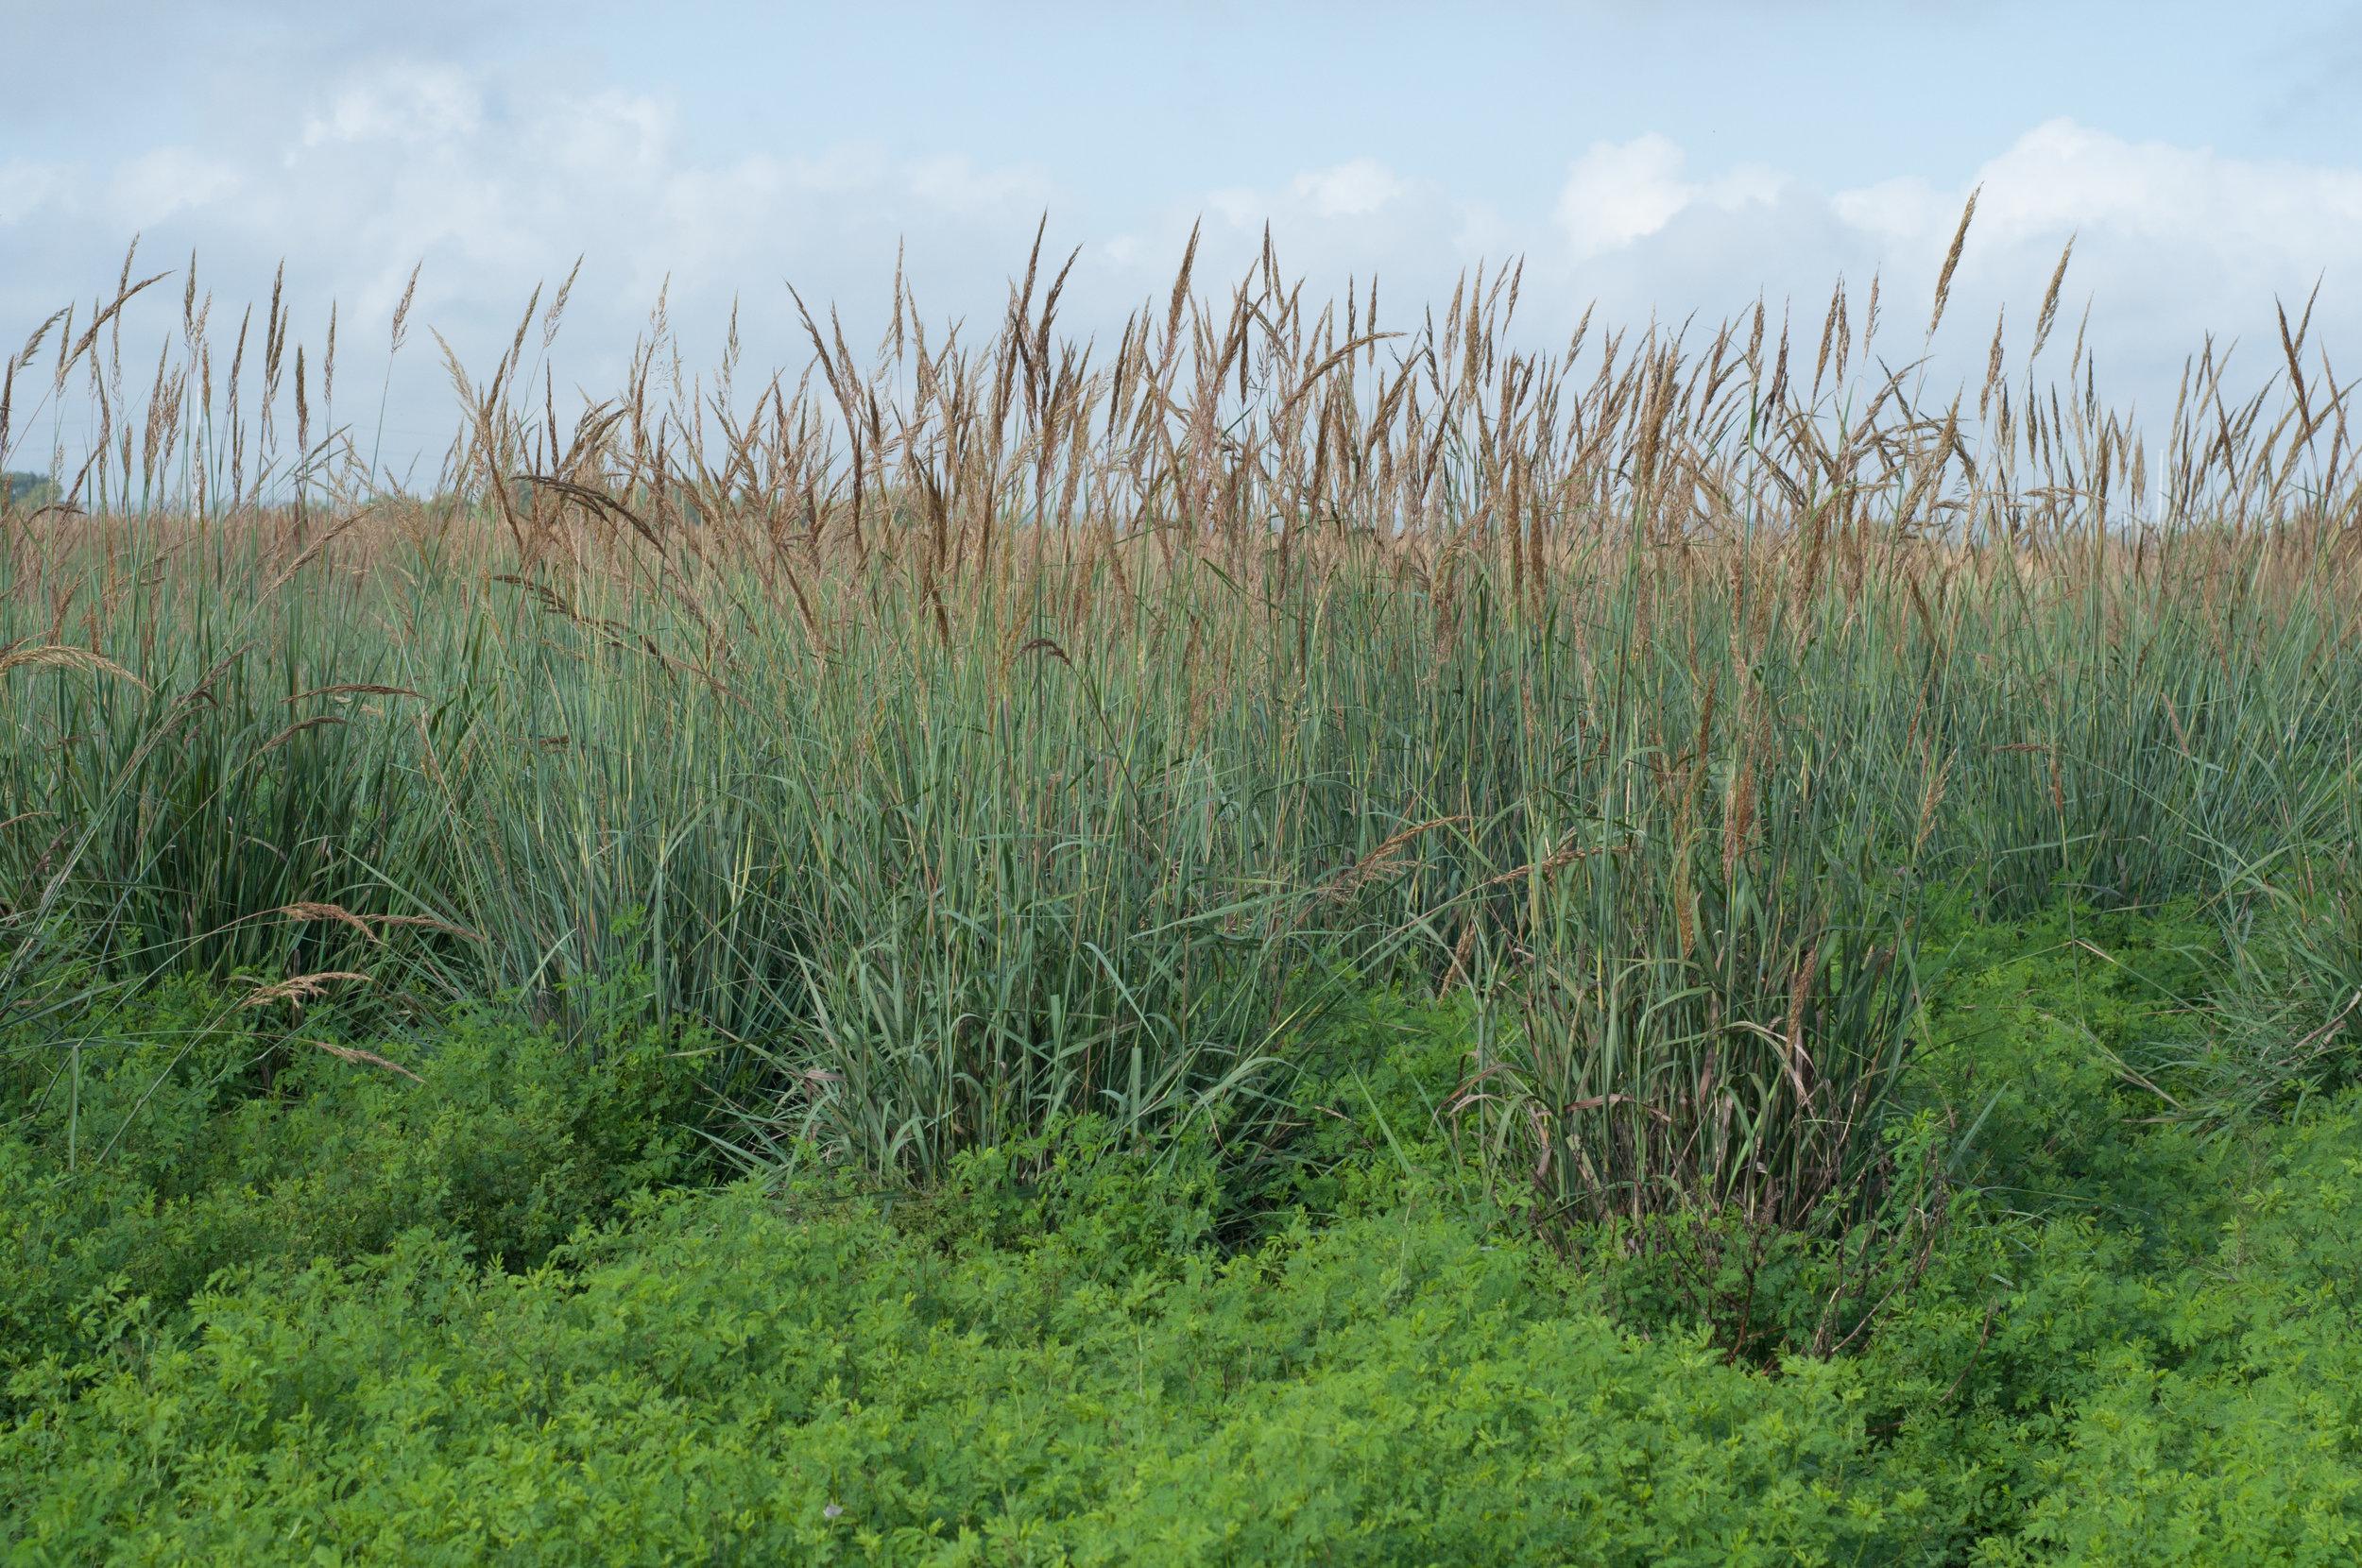 Lometa Indiangrass